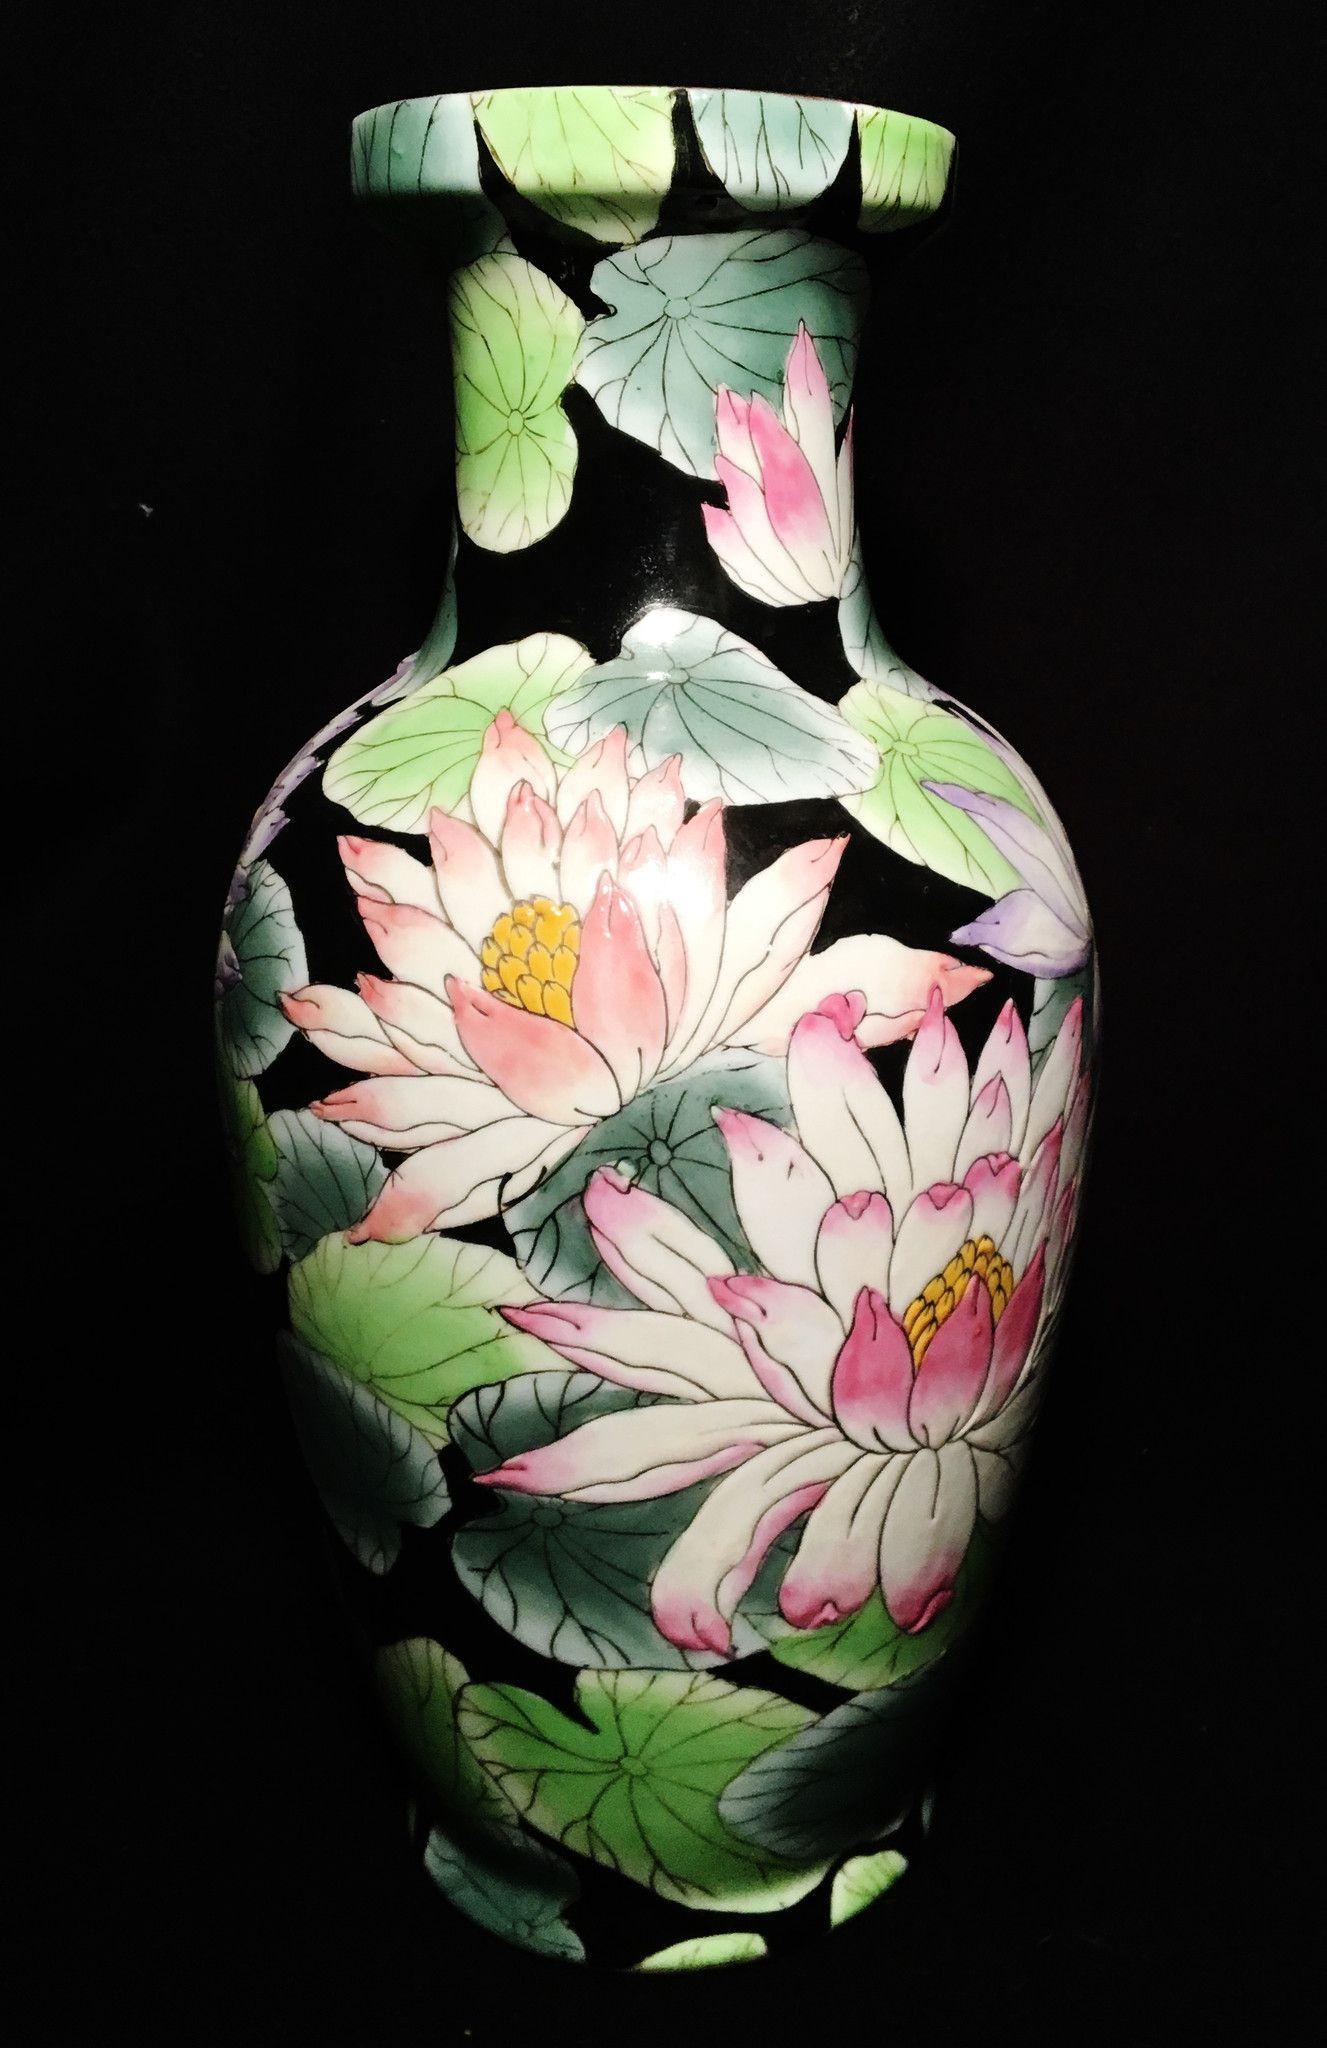 2 1900 1940 hand painted porcelain black lotus toyo japanese vases 2 1900 1940 hand painted porcelain black lotus toyo japanese vases reviewsmspy